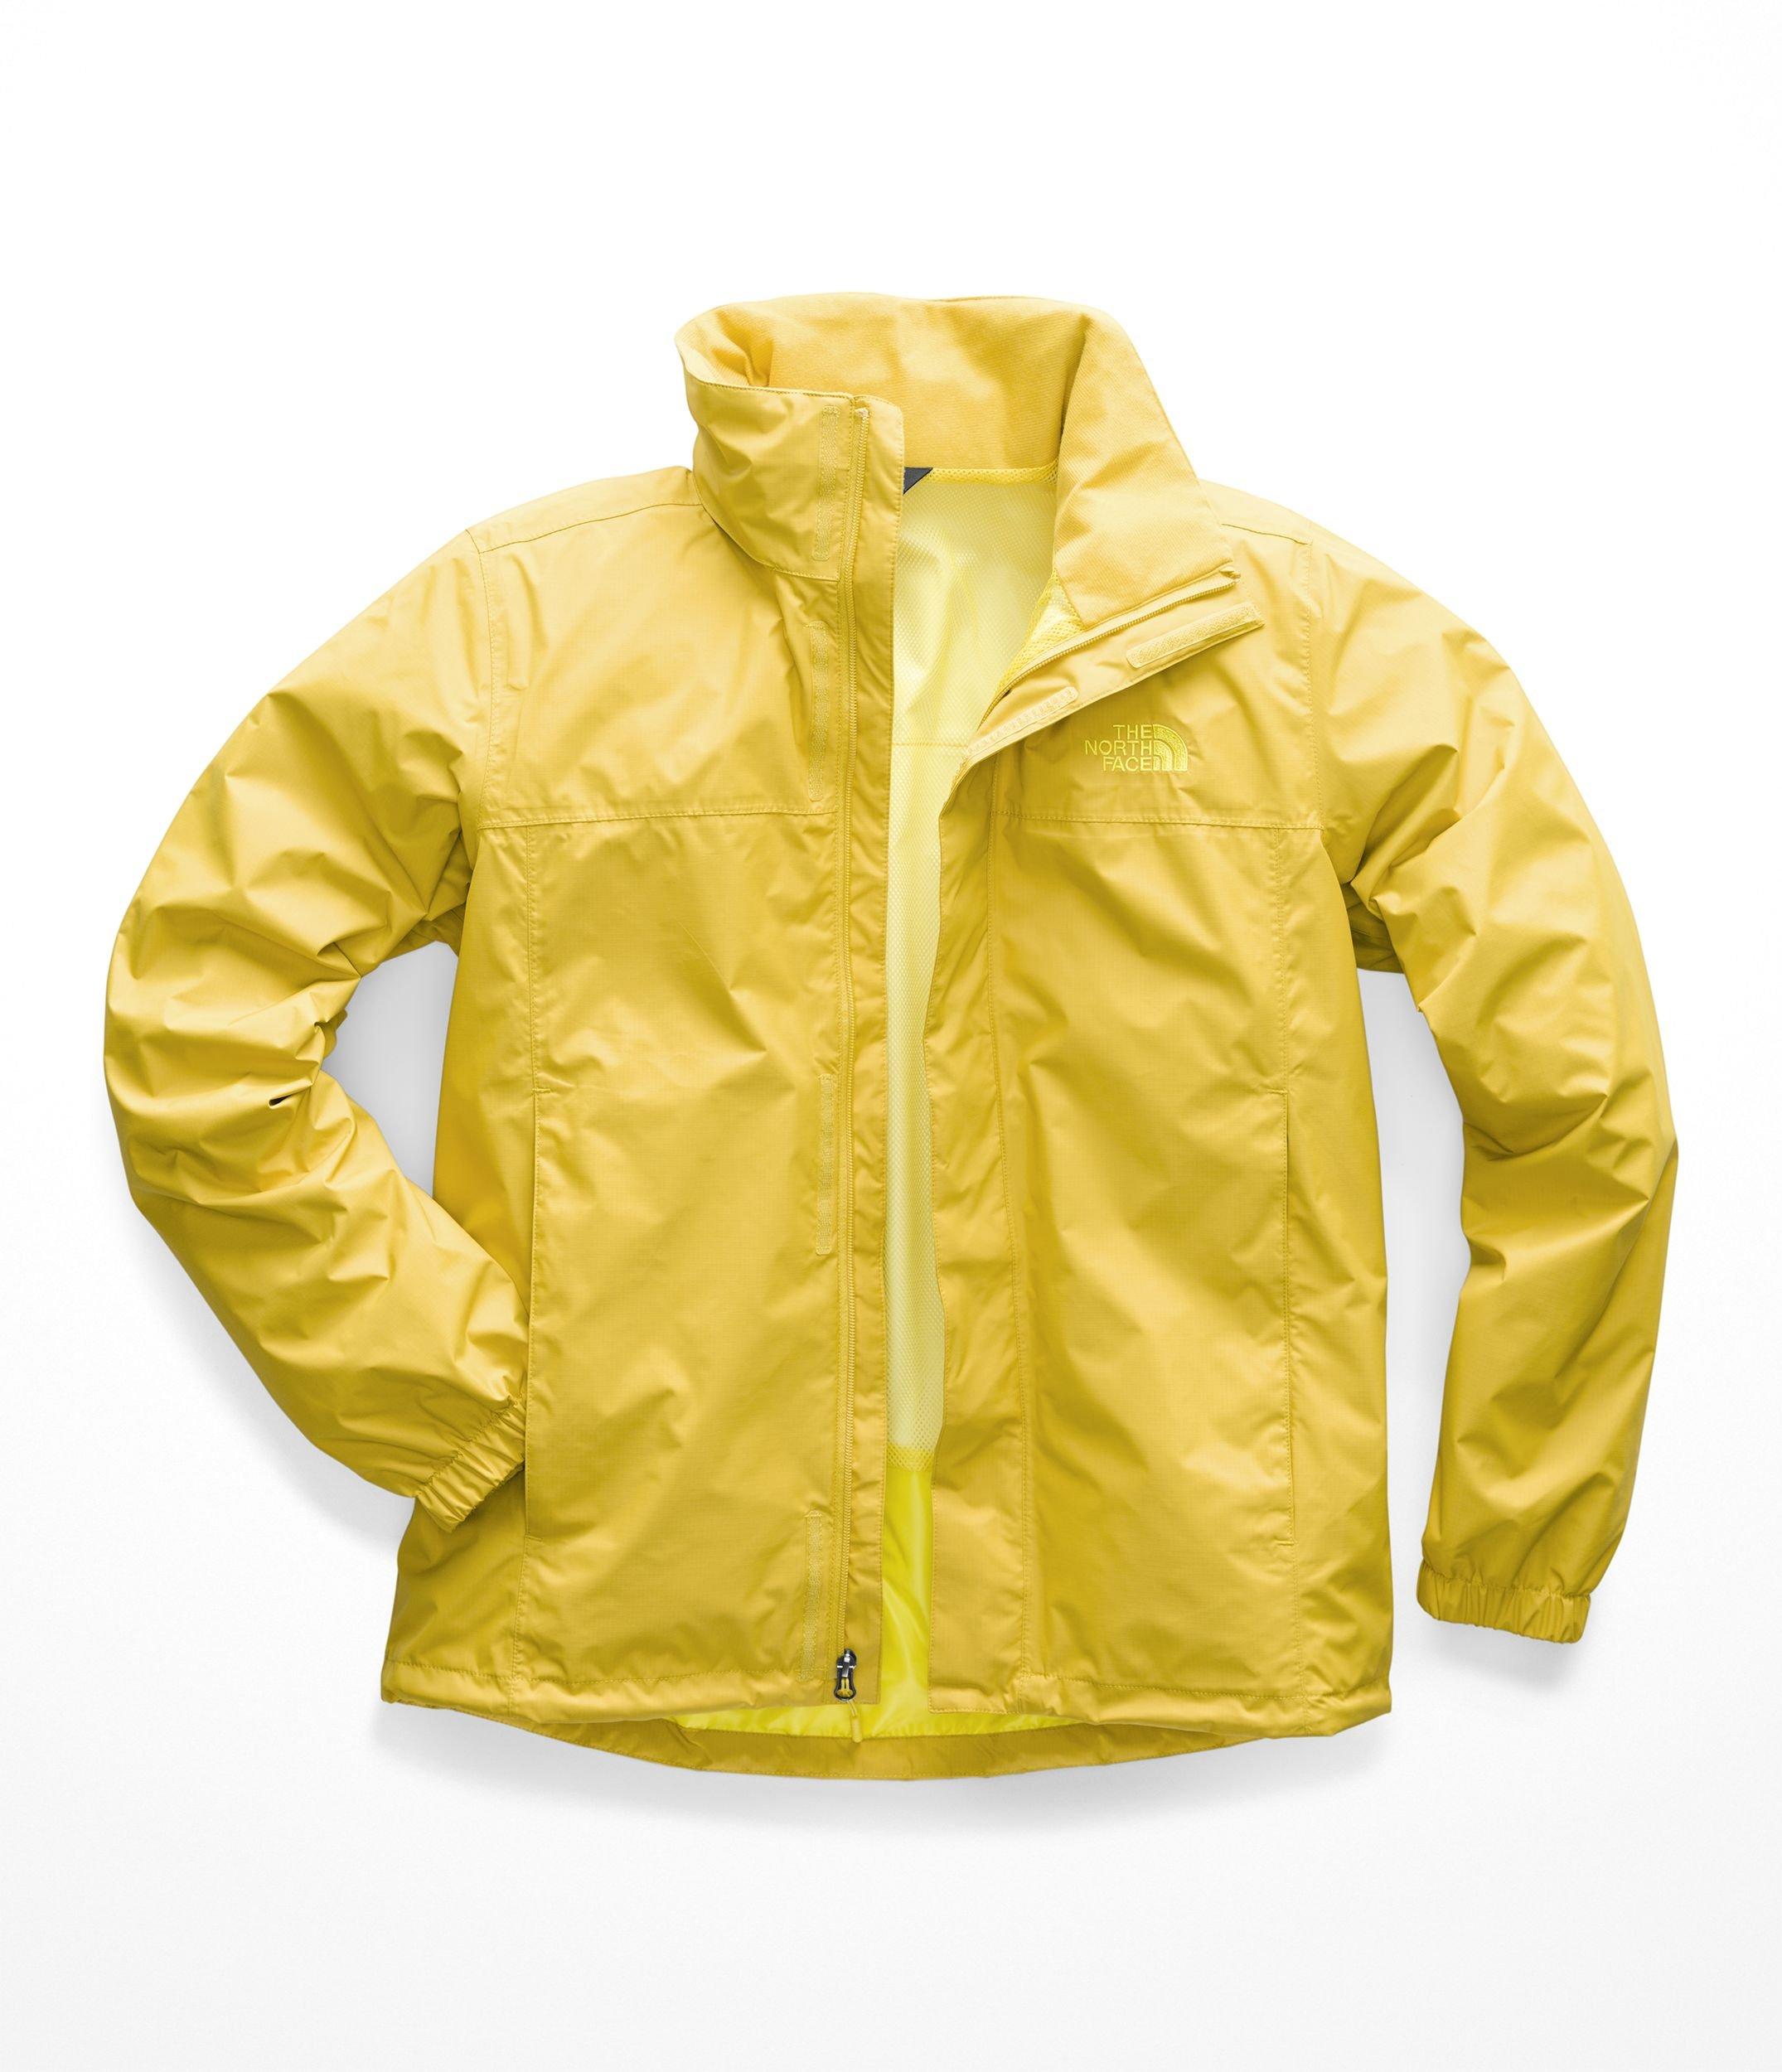 The North Face Men's Resolve 2 Jacket - Leopard Yellow & Acid Yellow - XXL